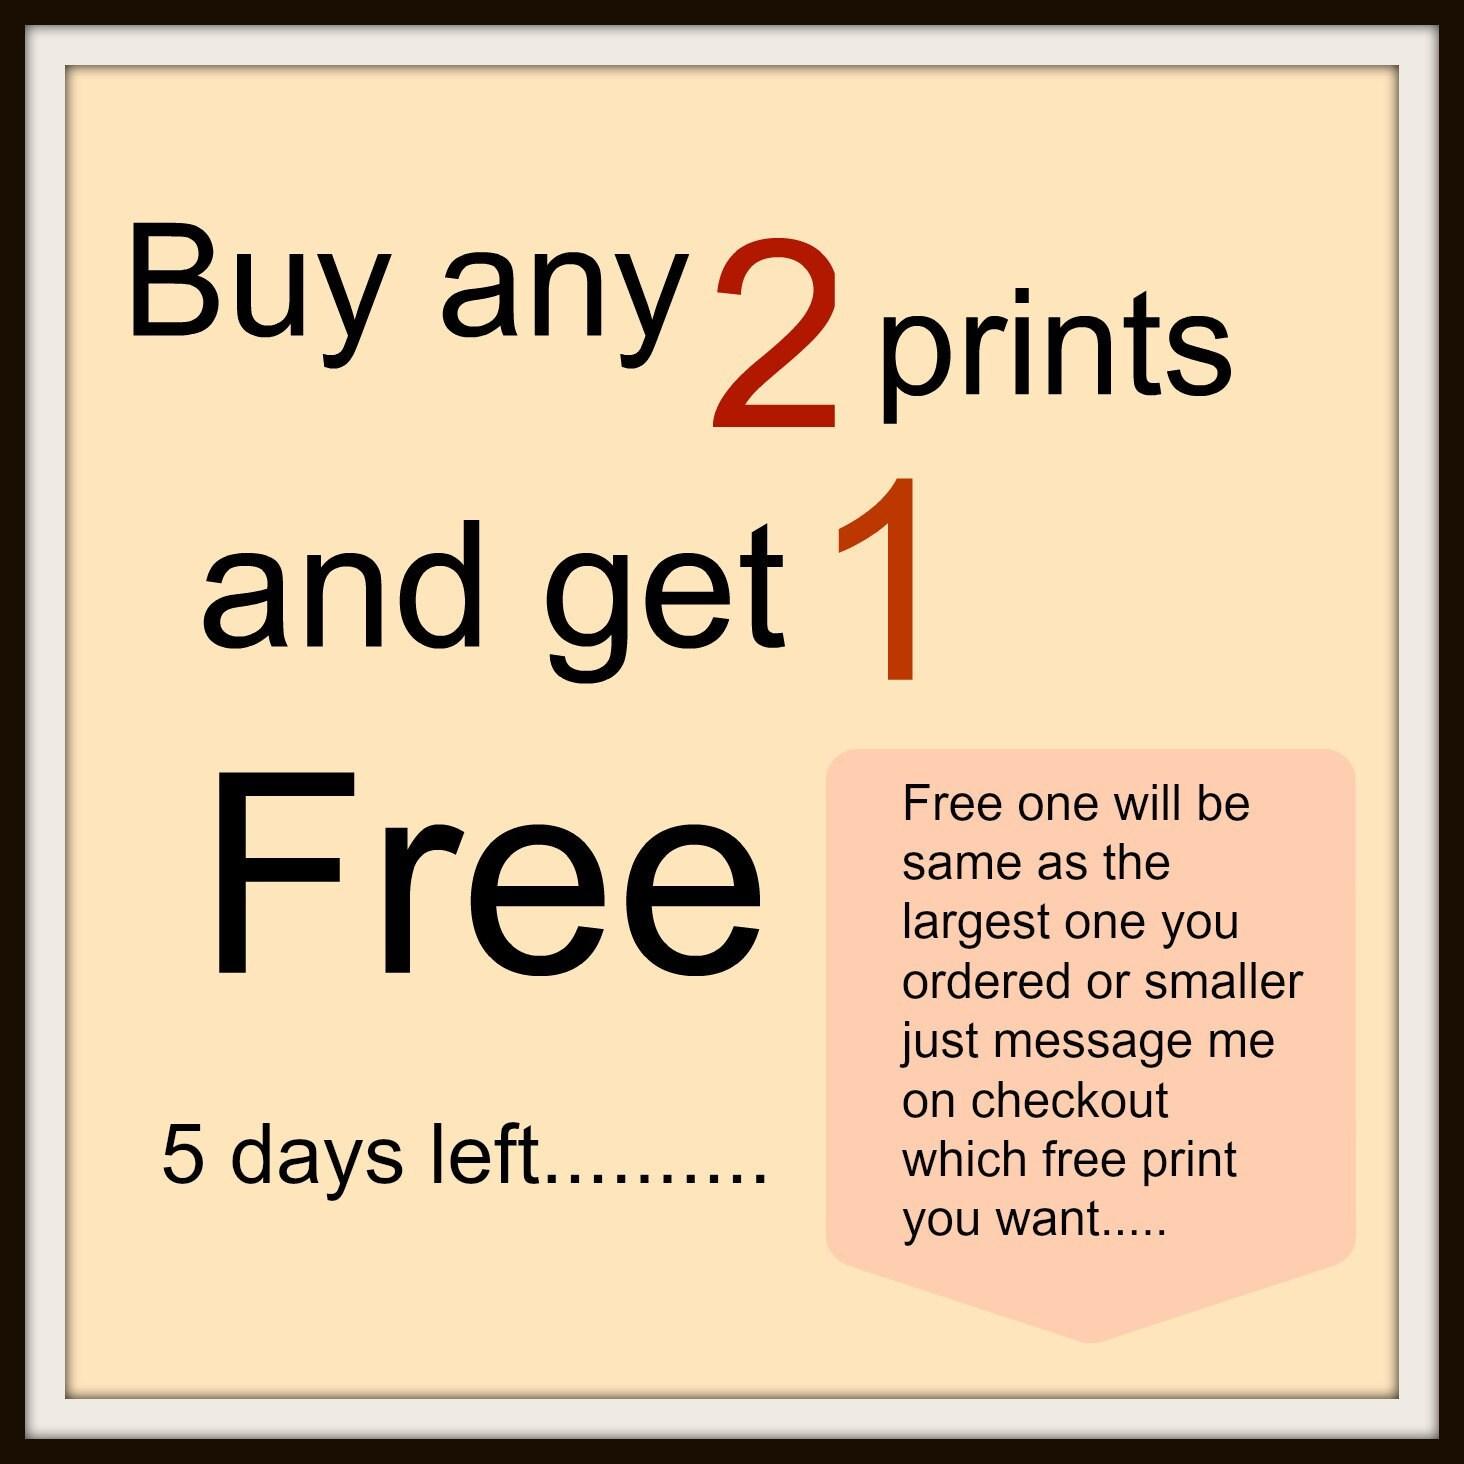 motivational printdigital printbedroom printtypography